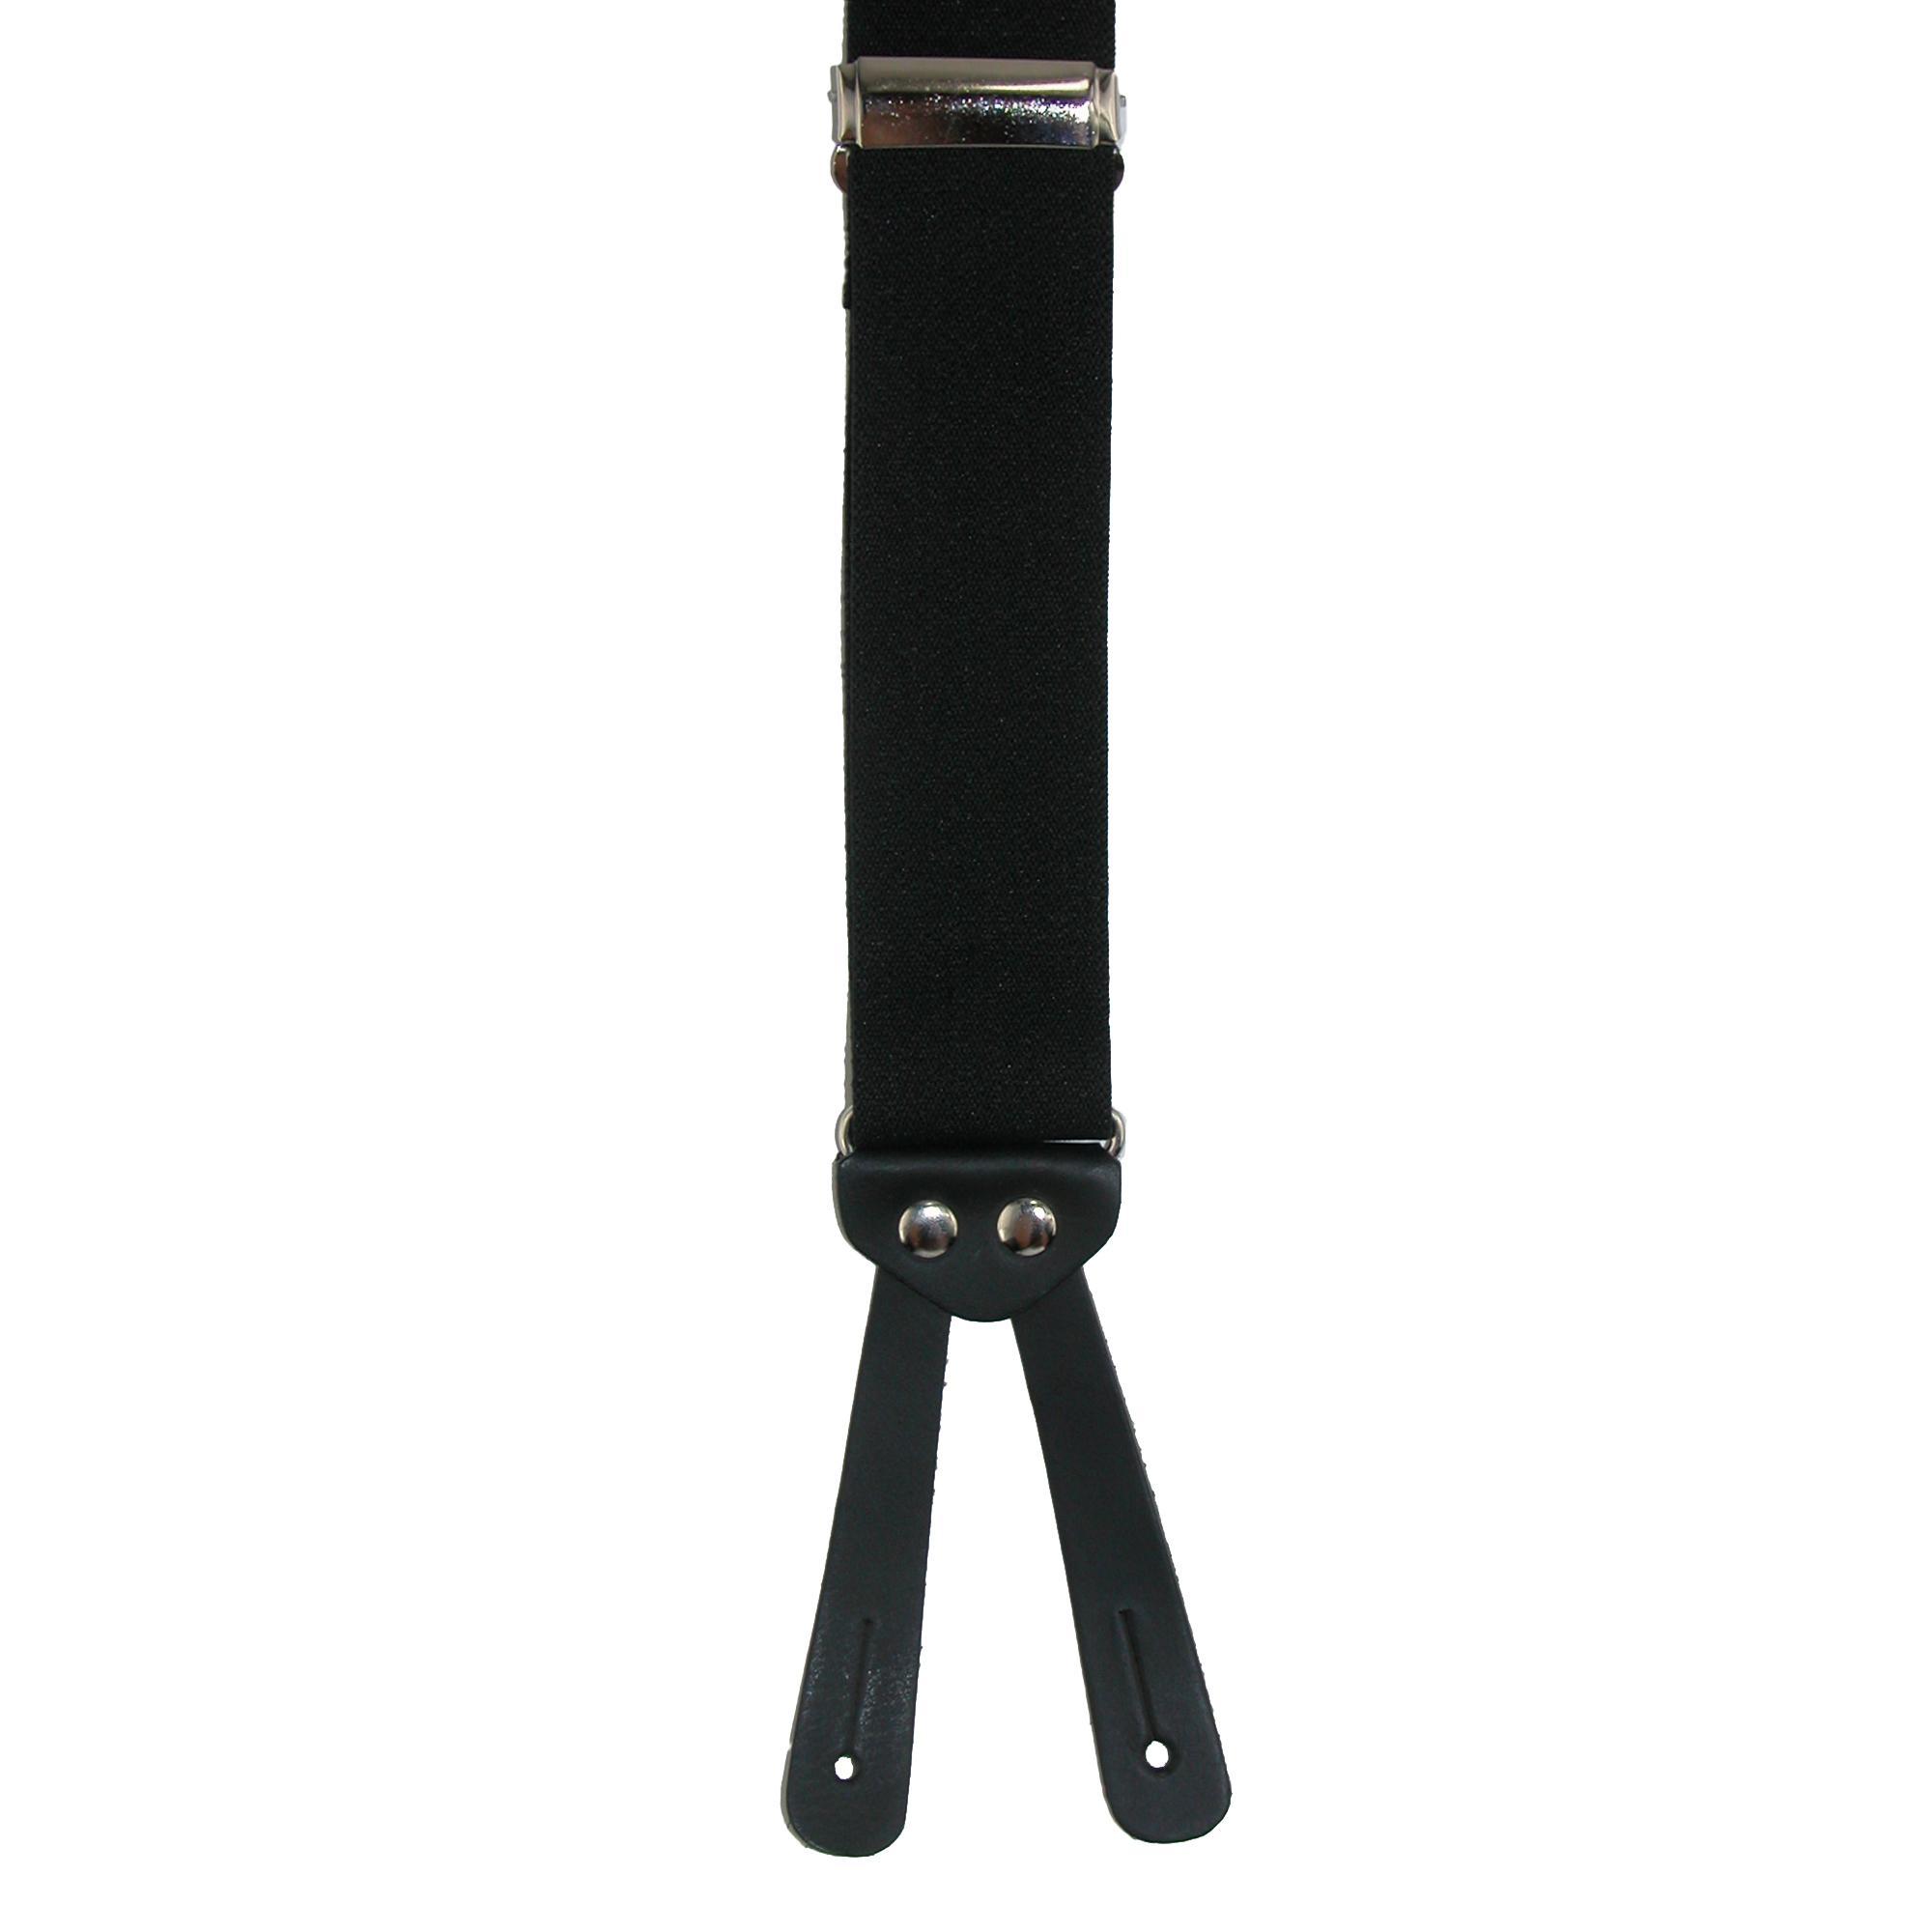 monogrammed tie clip necktie extra strong clasp with wooden gift box MyResinJewelry T3516M-1C Handmade monogram tie bar